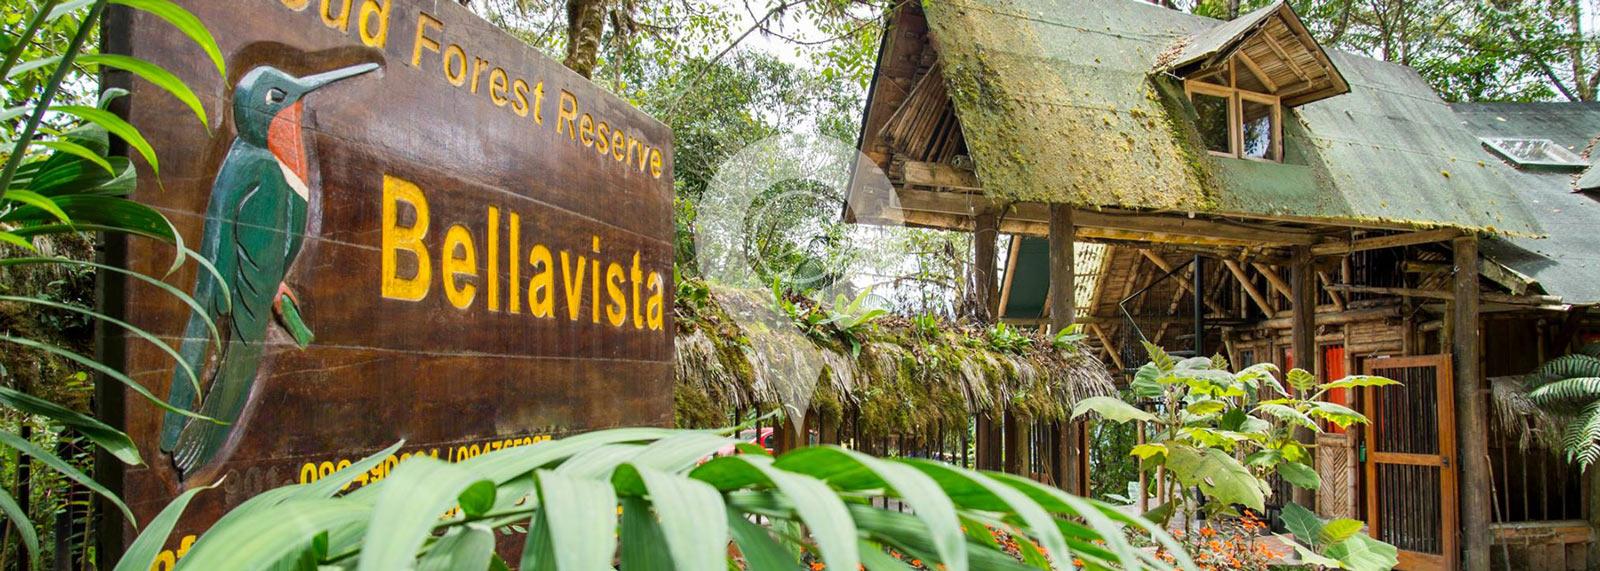 Bellavista Cloudforest Reserve